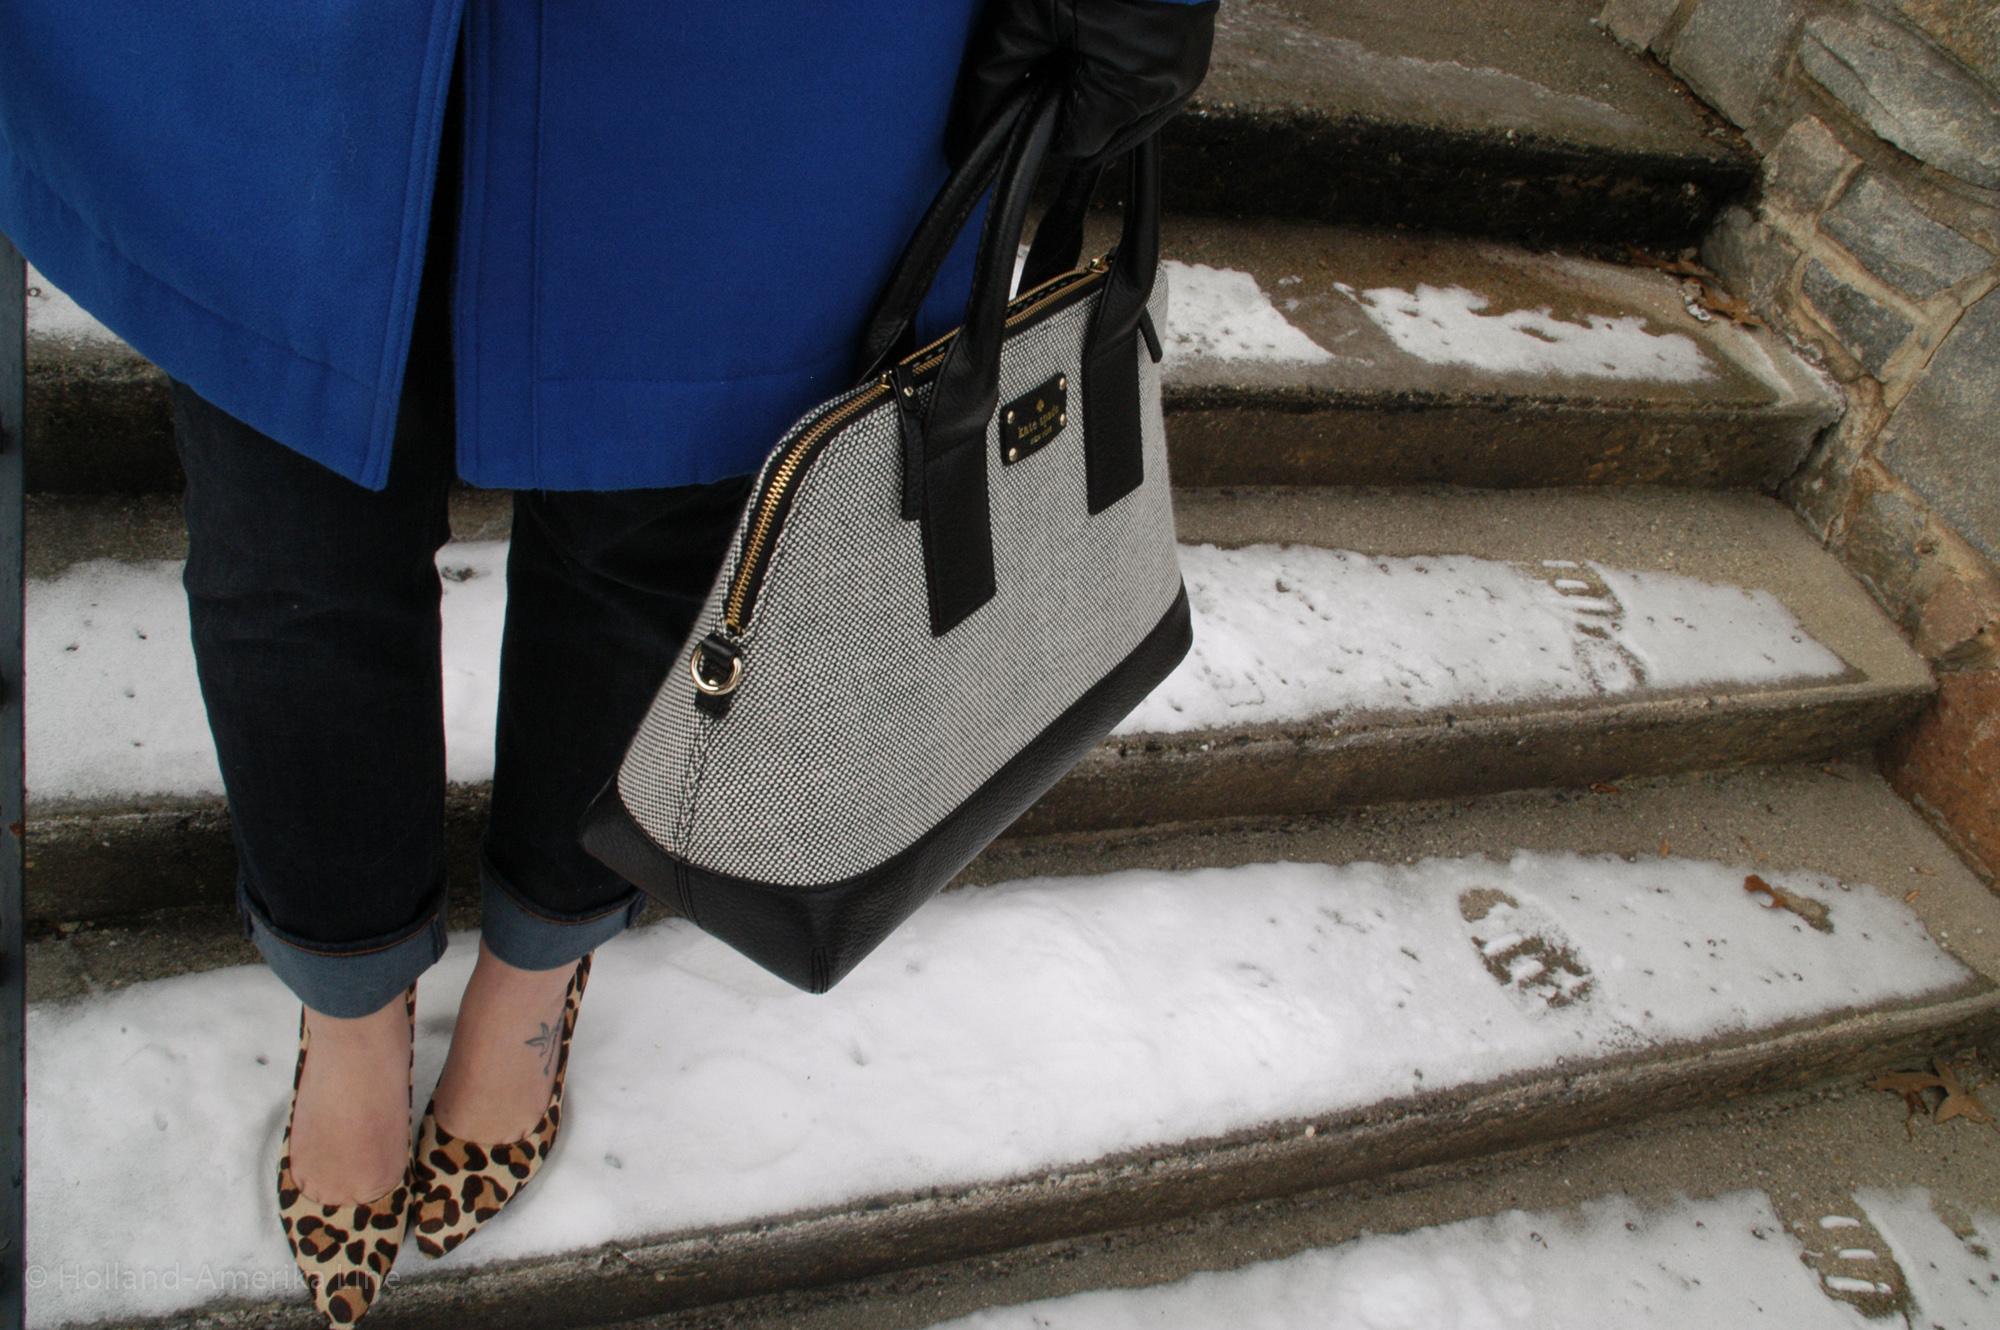 Coat: Worthington via JCPenney | Jeans:  J.Crew  | Shoes: Nicole | Bag: Kate Spade | Gloves: Target ( similar ) | Glasses:  Rayban  | Earrings: J.Crew ( similar )